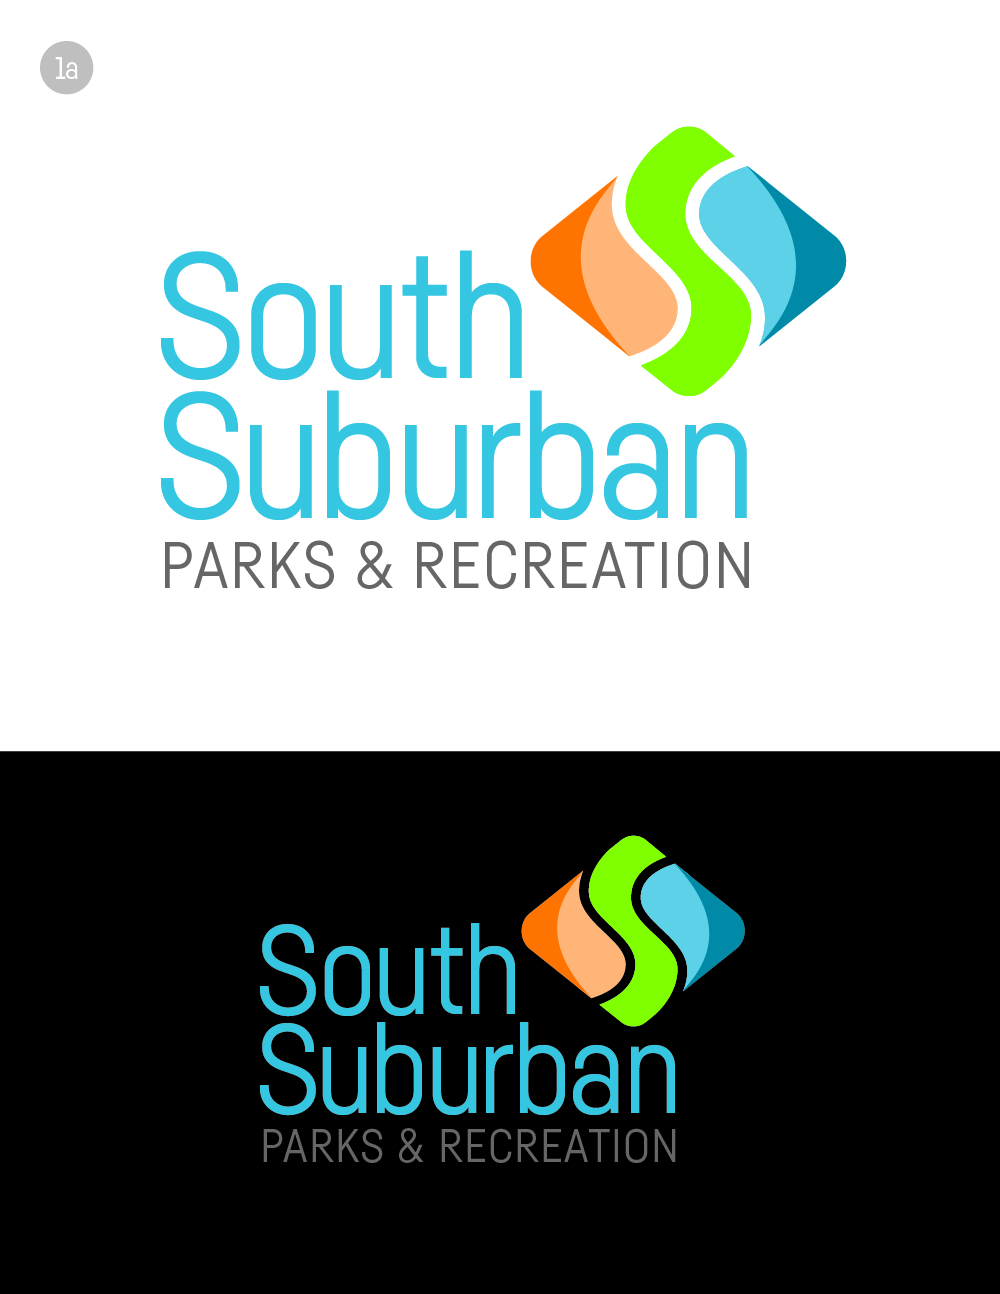 2018-05-03 SS logo 1a.jpg